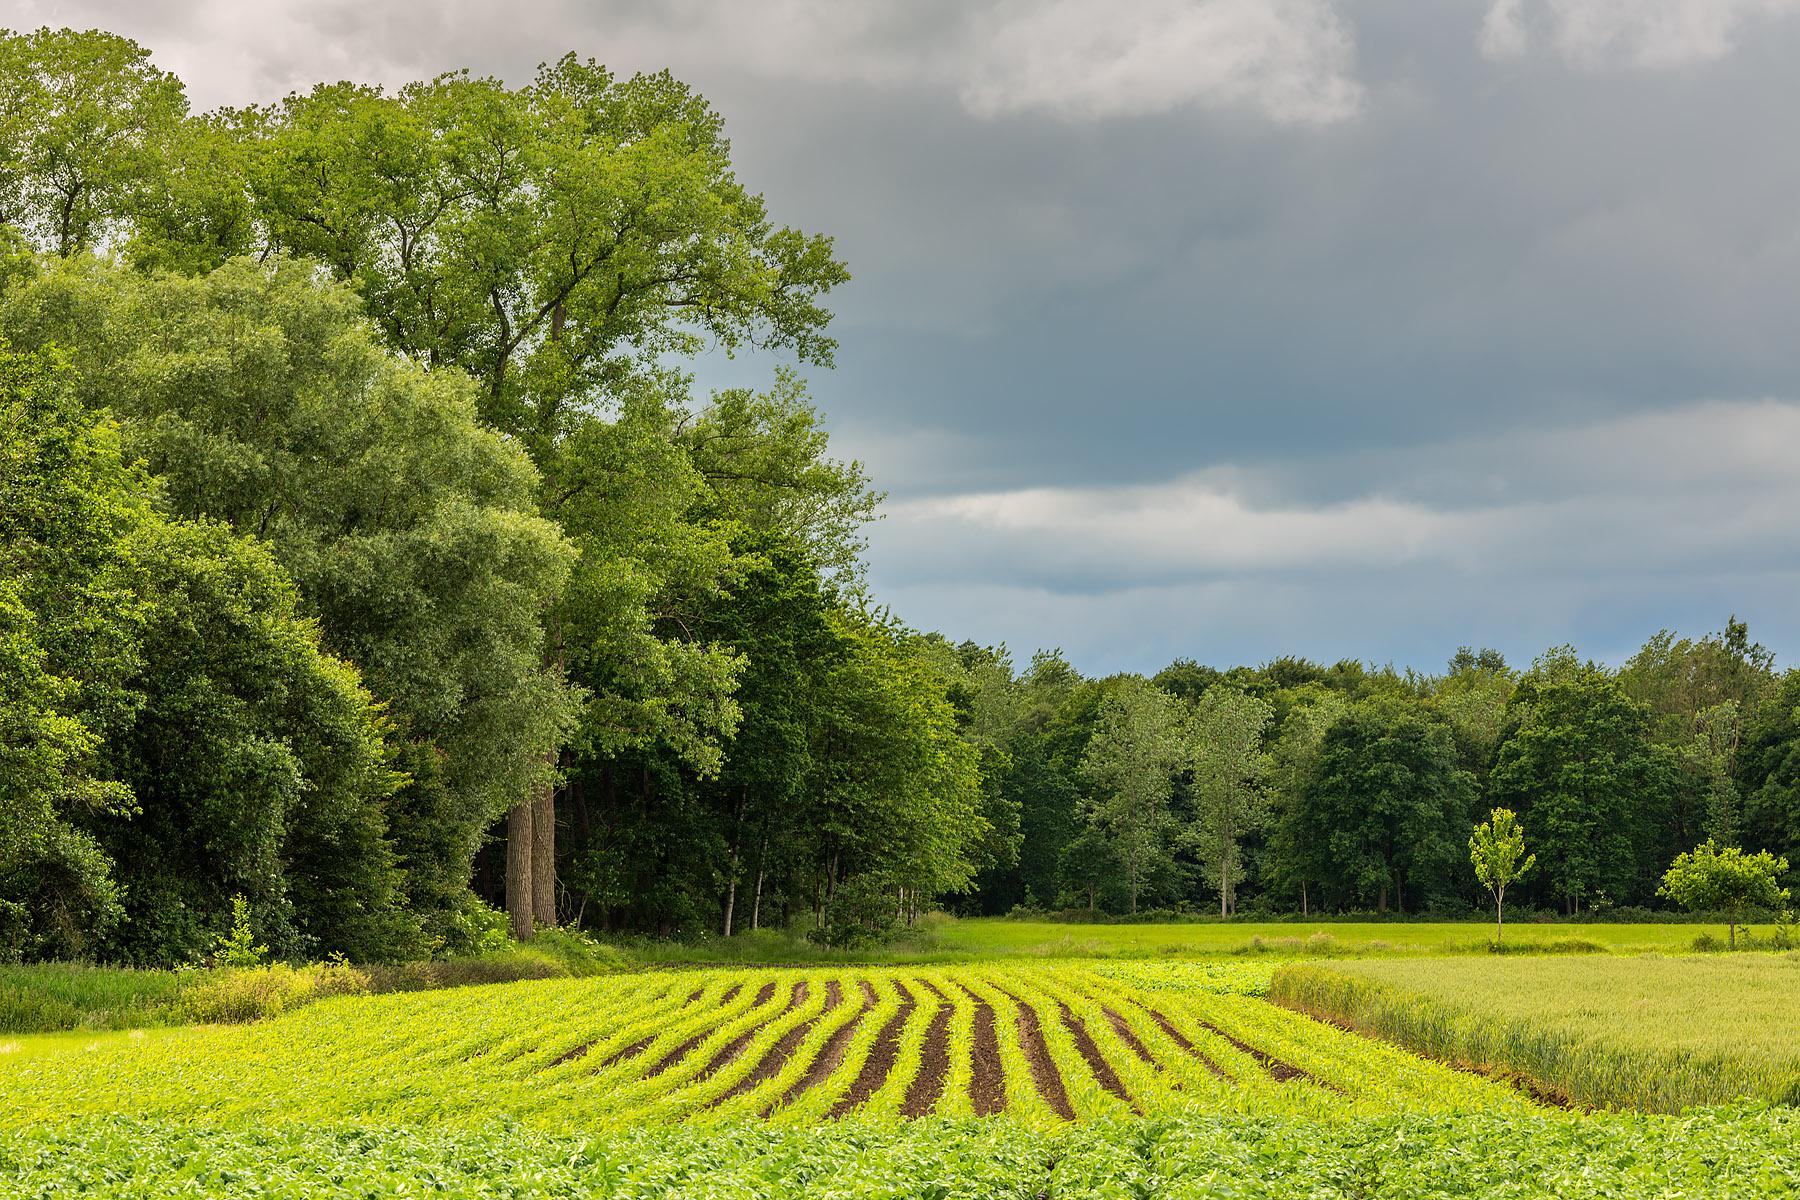 glenn vanderbeke, landschapsfotografie, landschapsfotograaf, foto uitstap, foto dagtrip, fotografische dagtrip, west-vlaamse fotografen, west-vlaamse fotograaf, Foto uitstap, Vlaanderen, West-Vlaanderen, stormchasing, onweersfotografie, stormchasing Torhout, stormchasing wijnendalebos, onweersofotografie Torhout, onweersfoto, onweersfotografie wijnendalebos, fotografie uitstap, fotogafie Torhout, Torhout, fotograaf Torhout